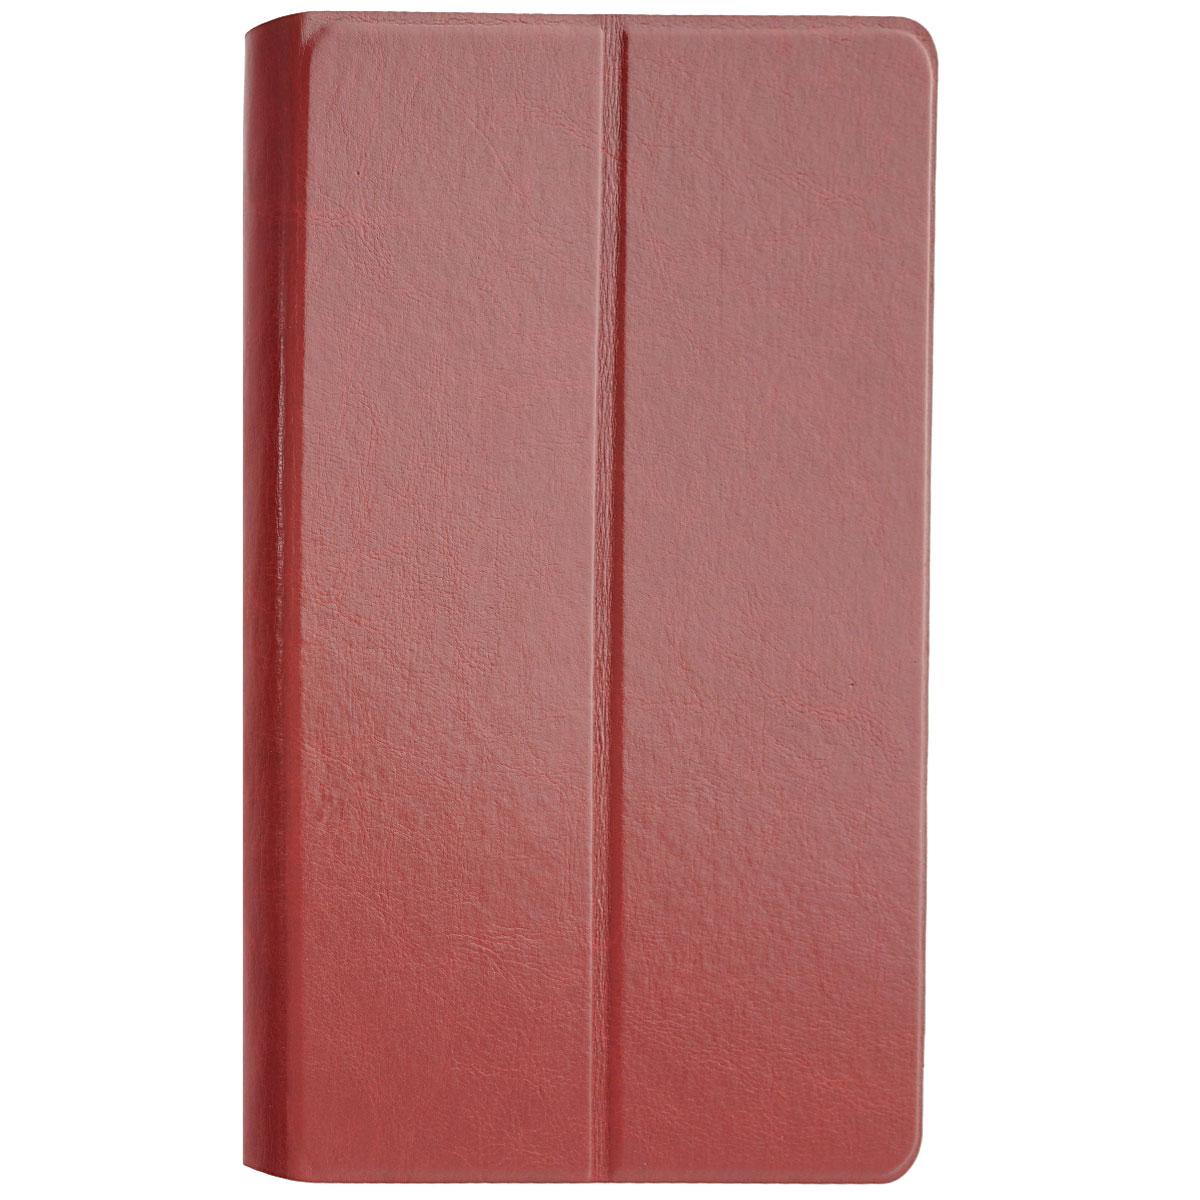 Tutti Frutti Duplex чехол для Apple iPad Air, Red White стоимость